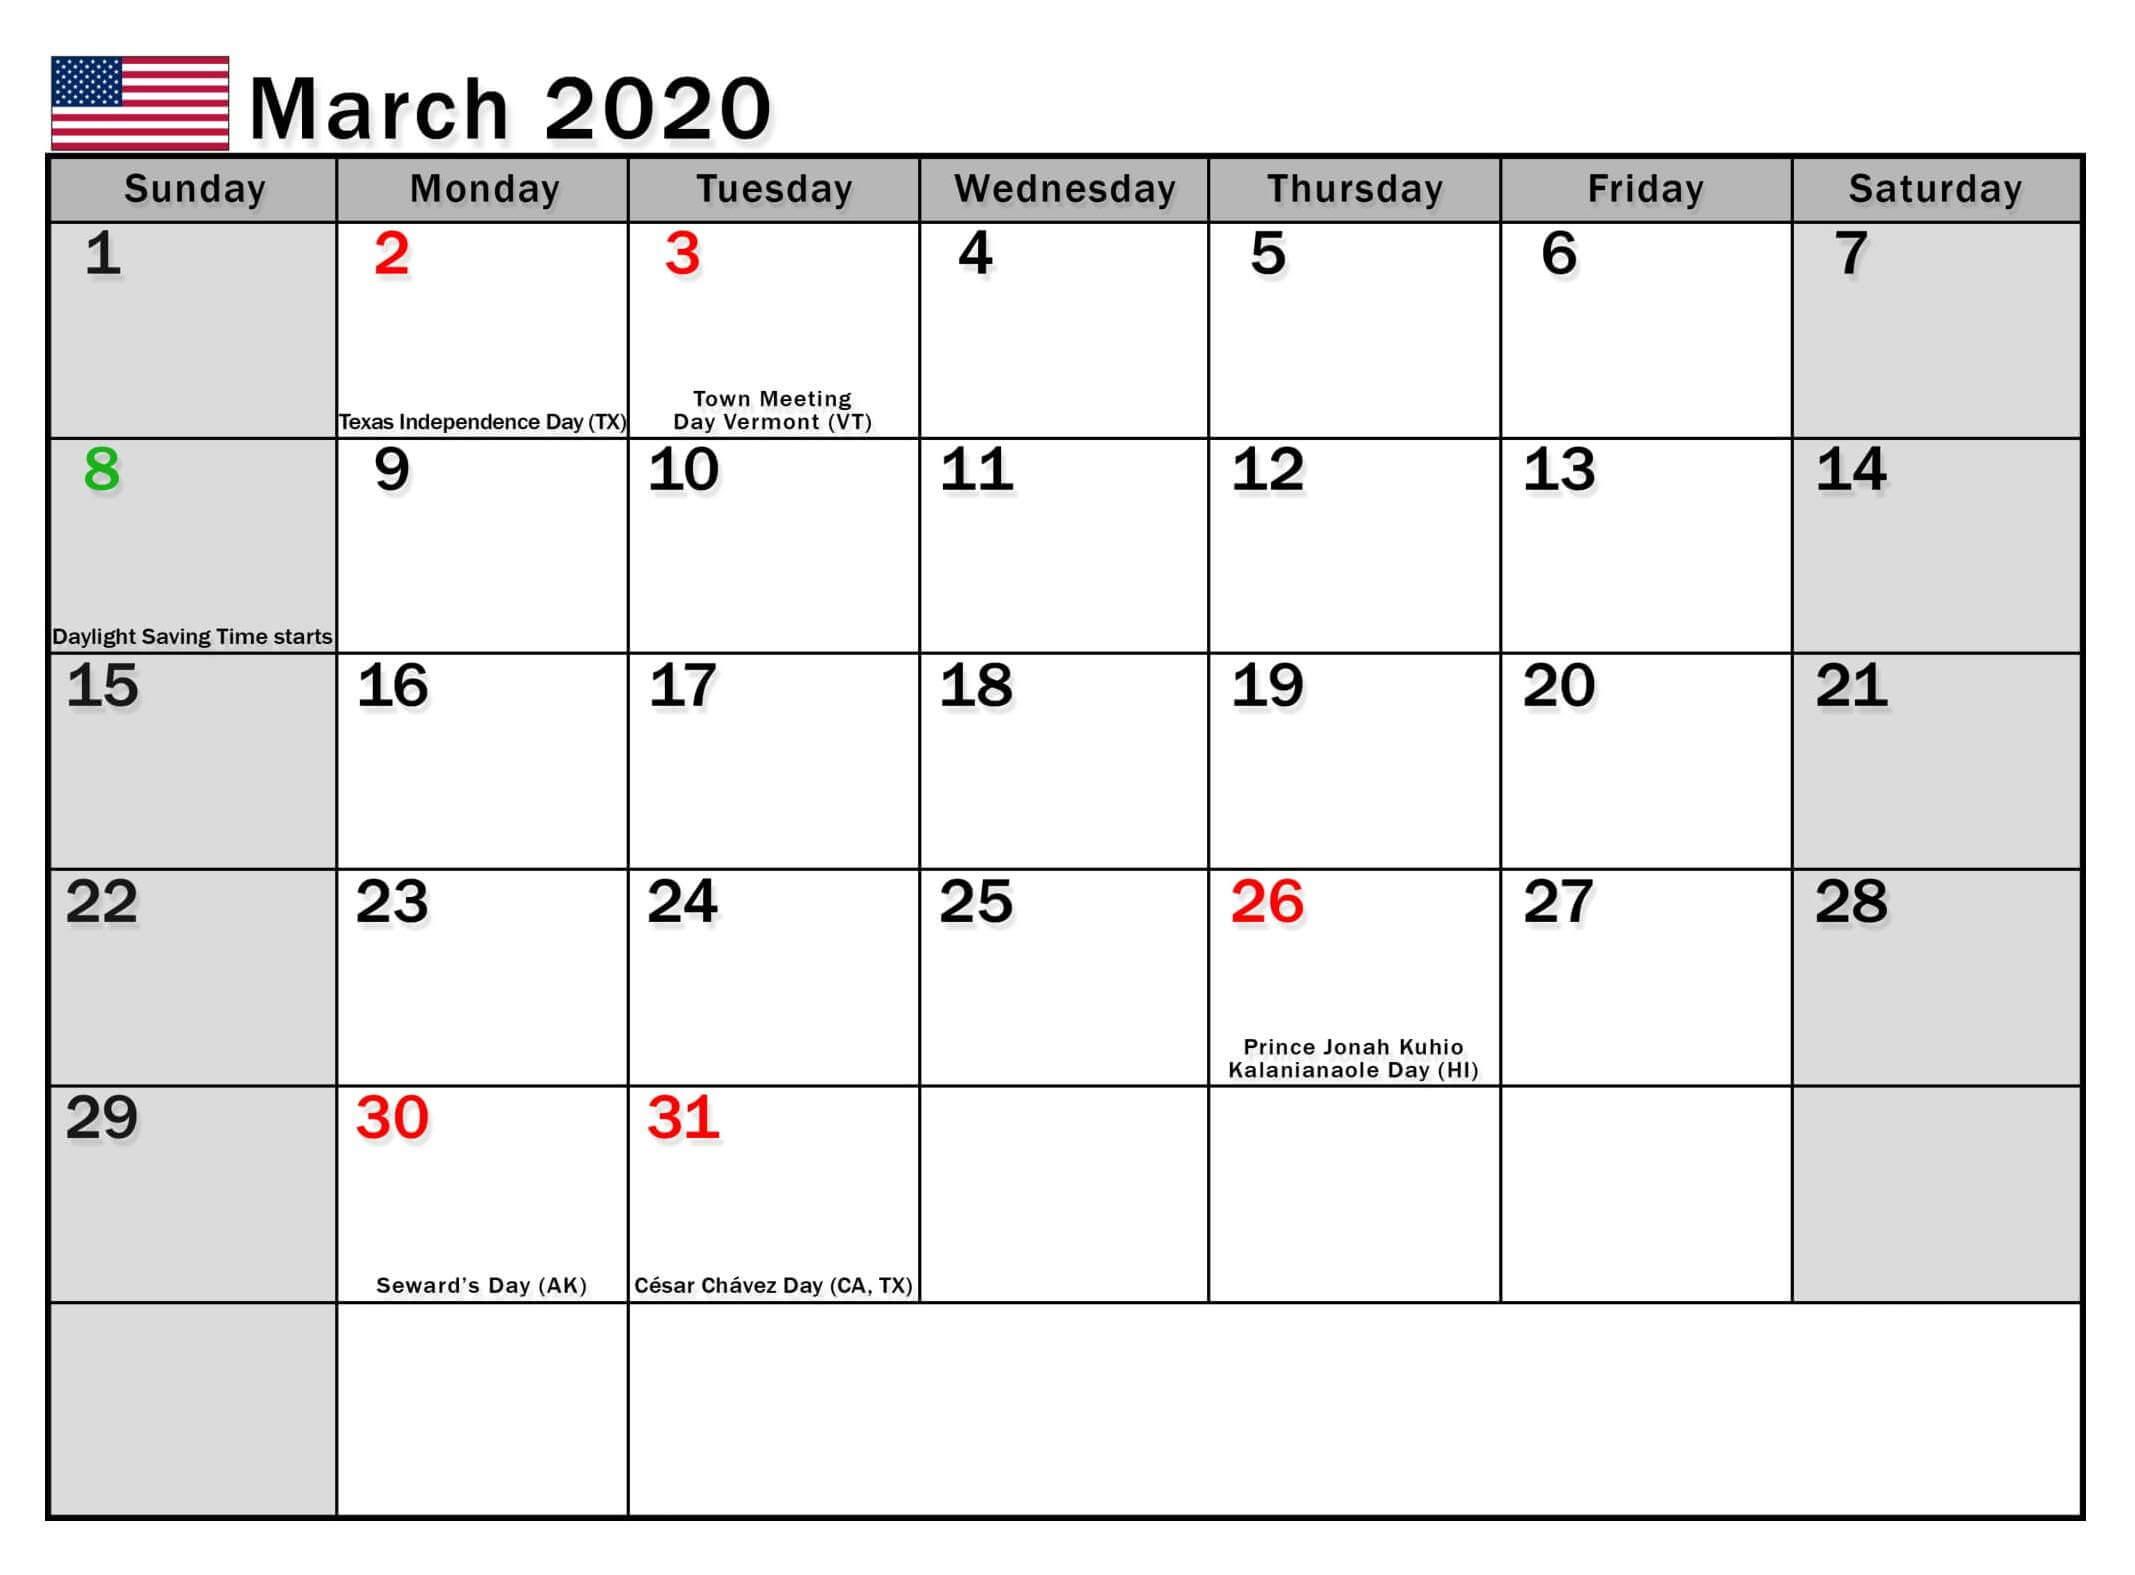 USA Holidays Calendar March 2020